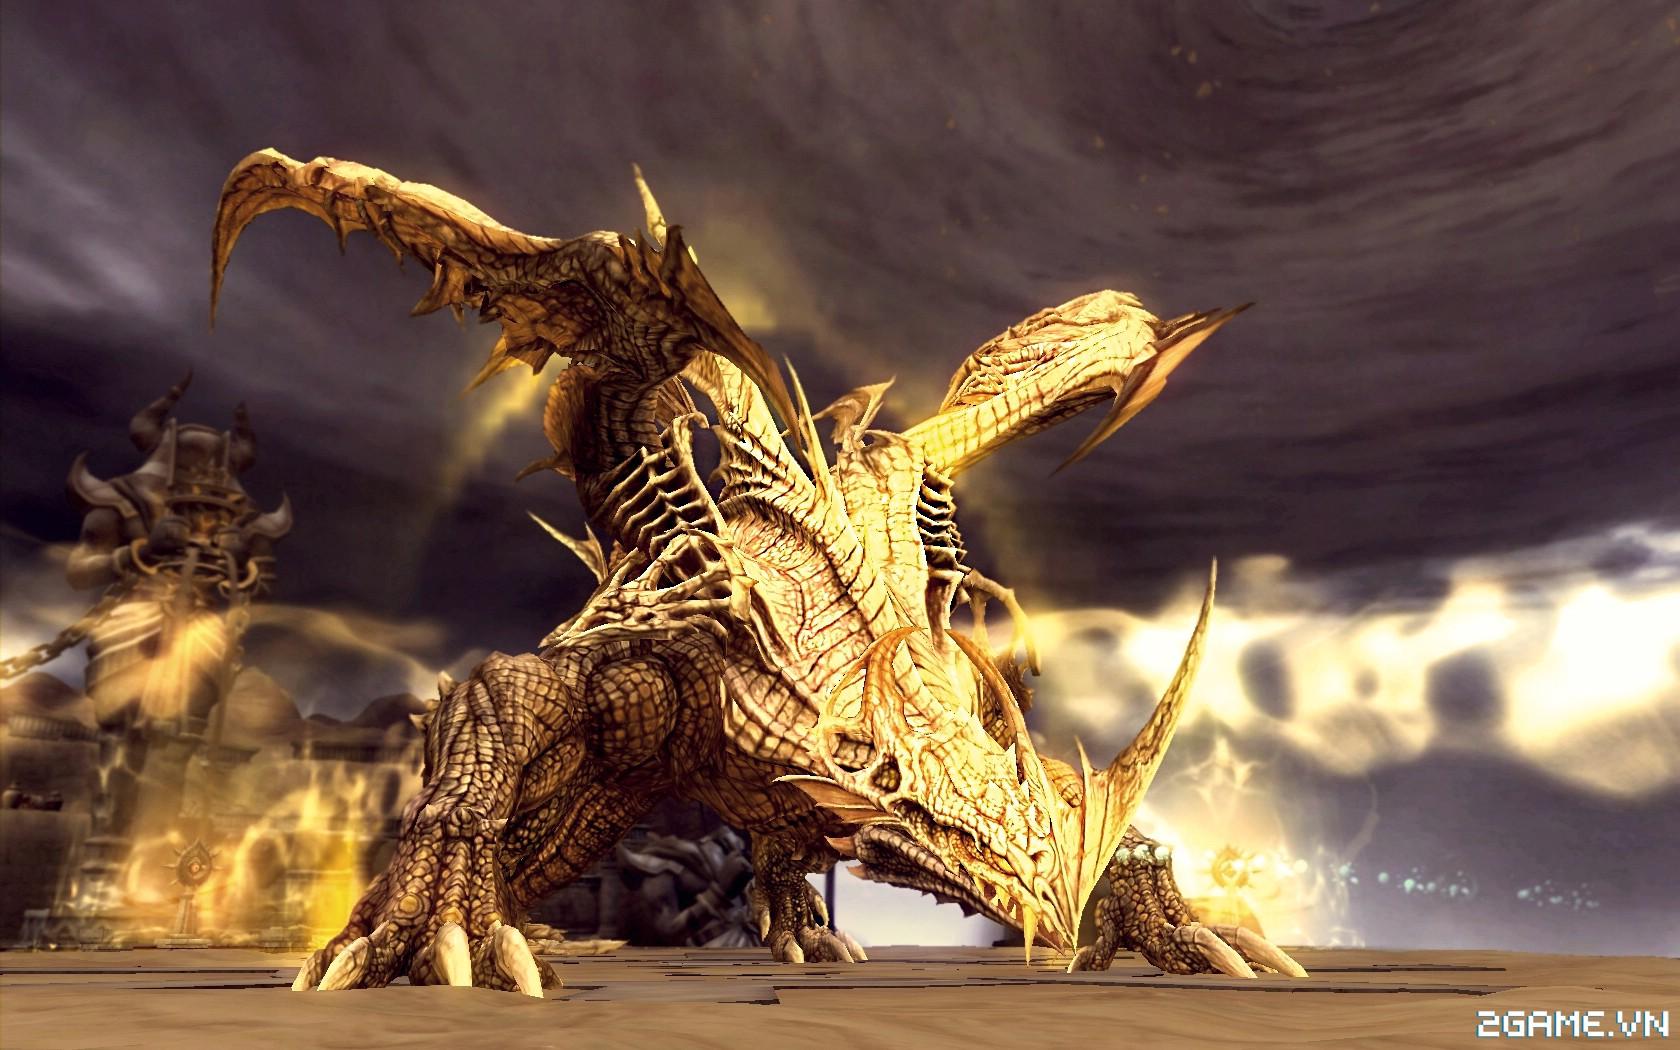 2game-anh-ingame-dragon-nest-hd-3.jpg (1680×1050)